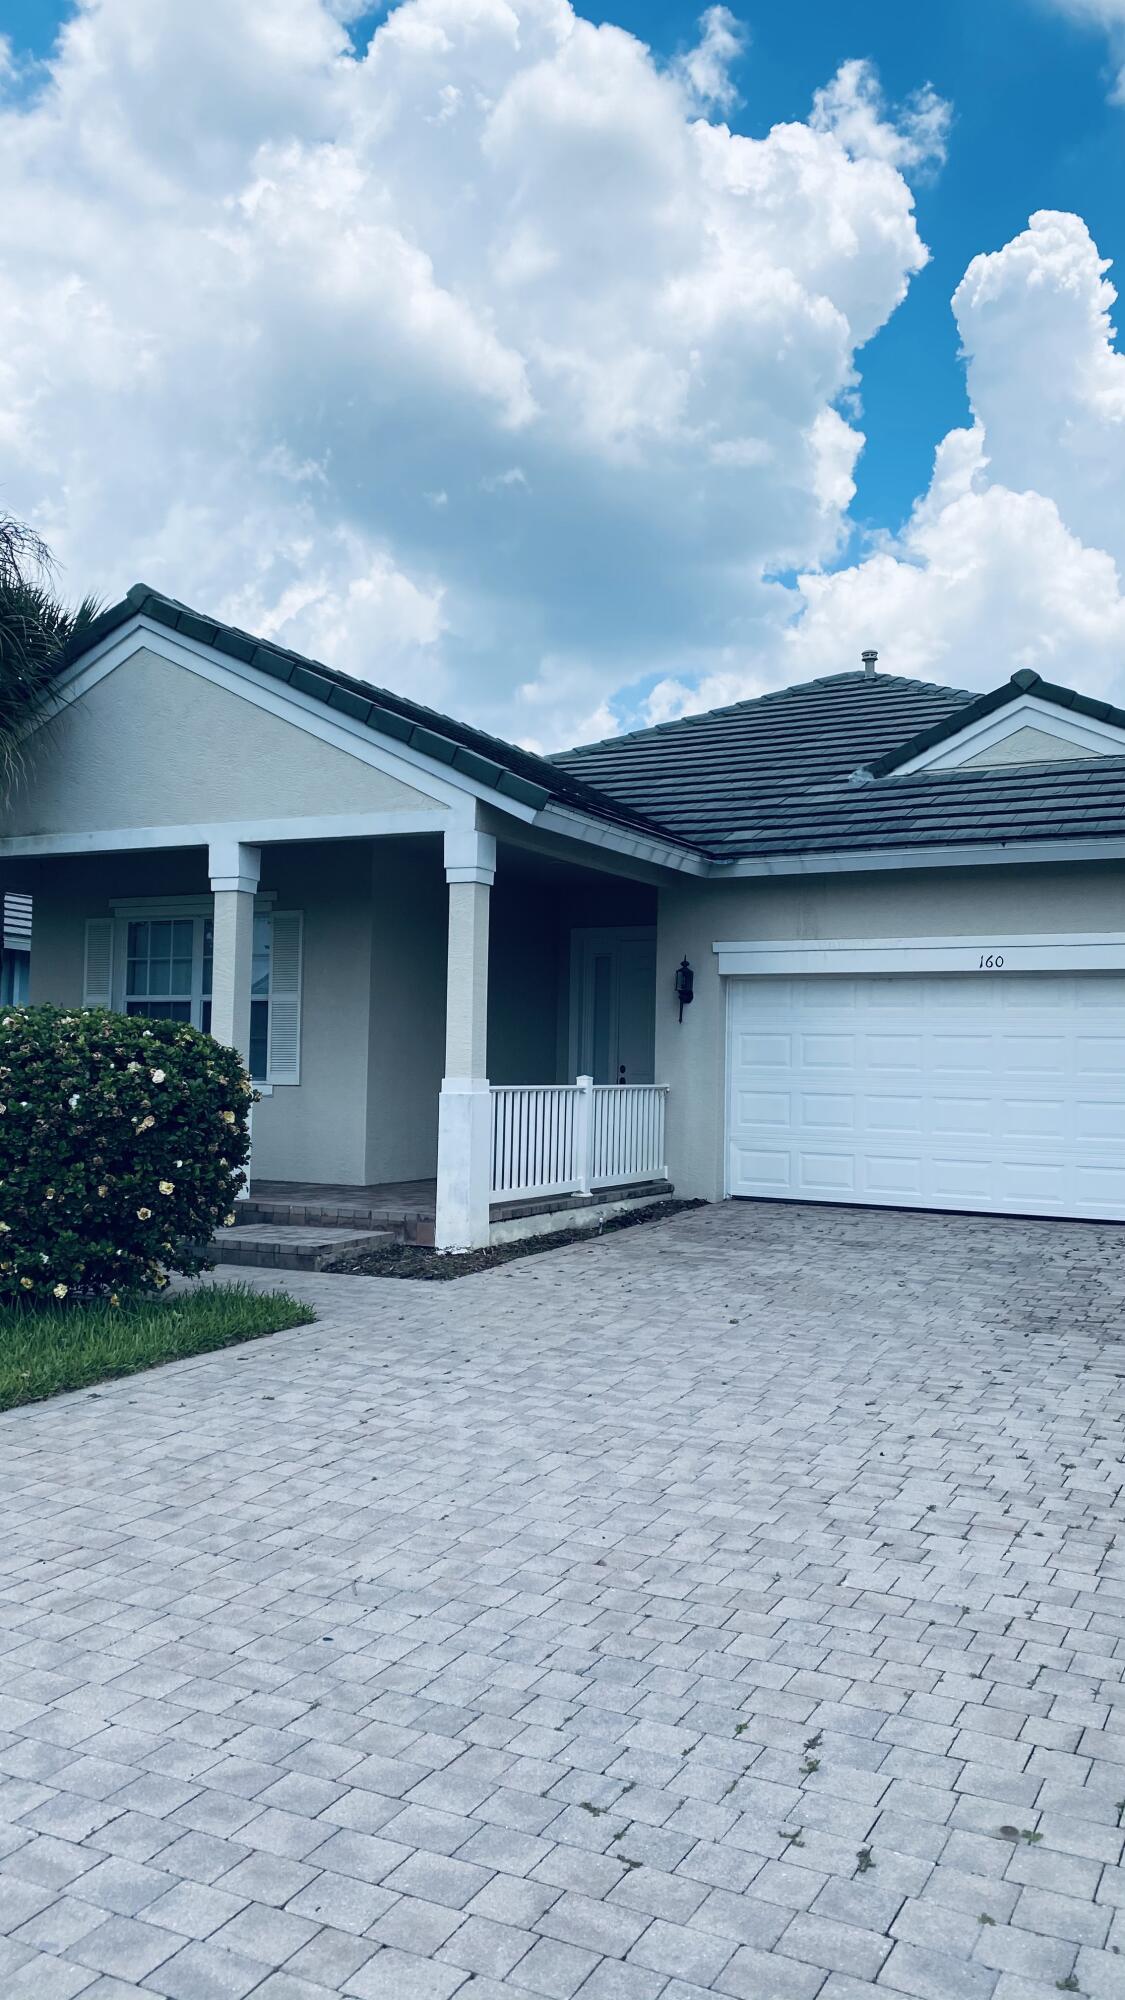 160 Nw Pleasant Grove Way, Port Saint Lucie, FL 34986